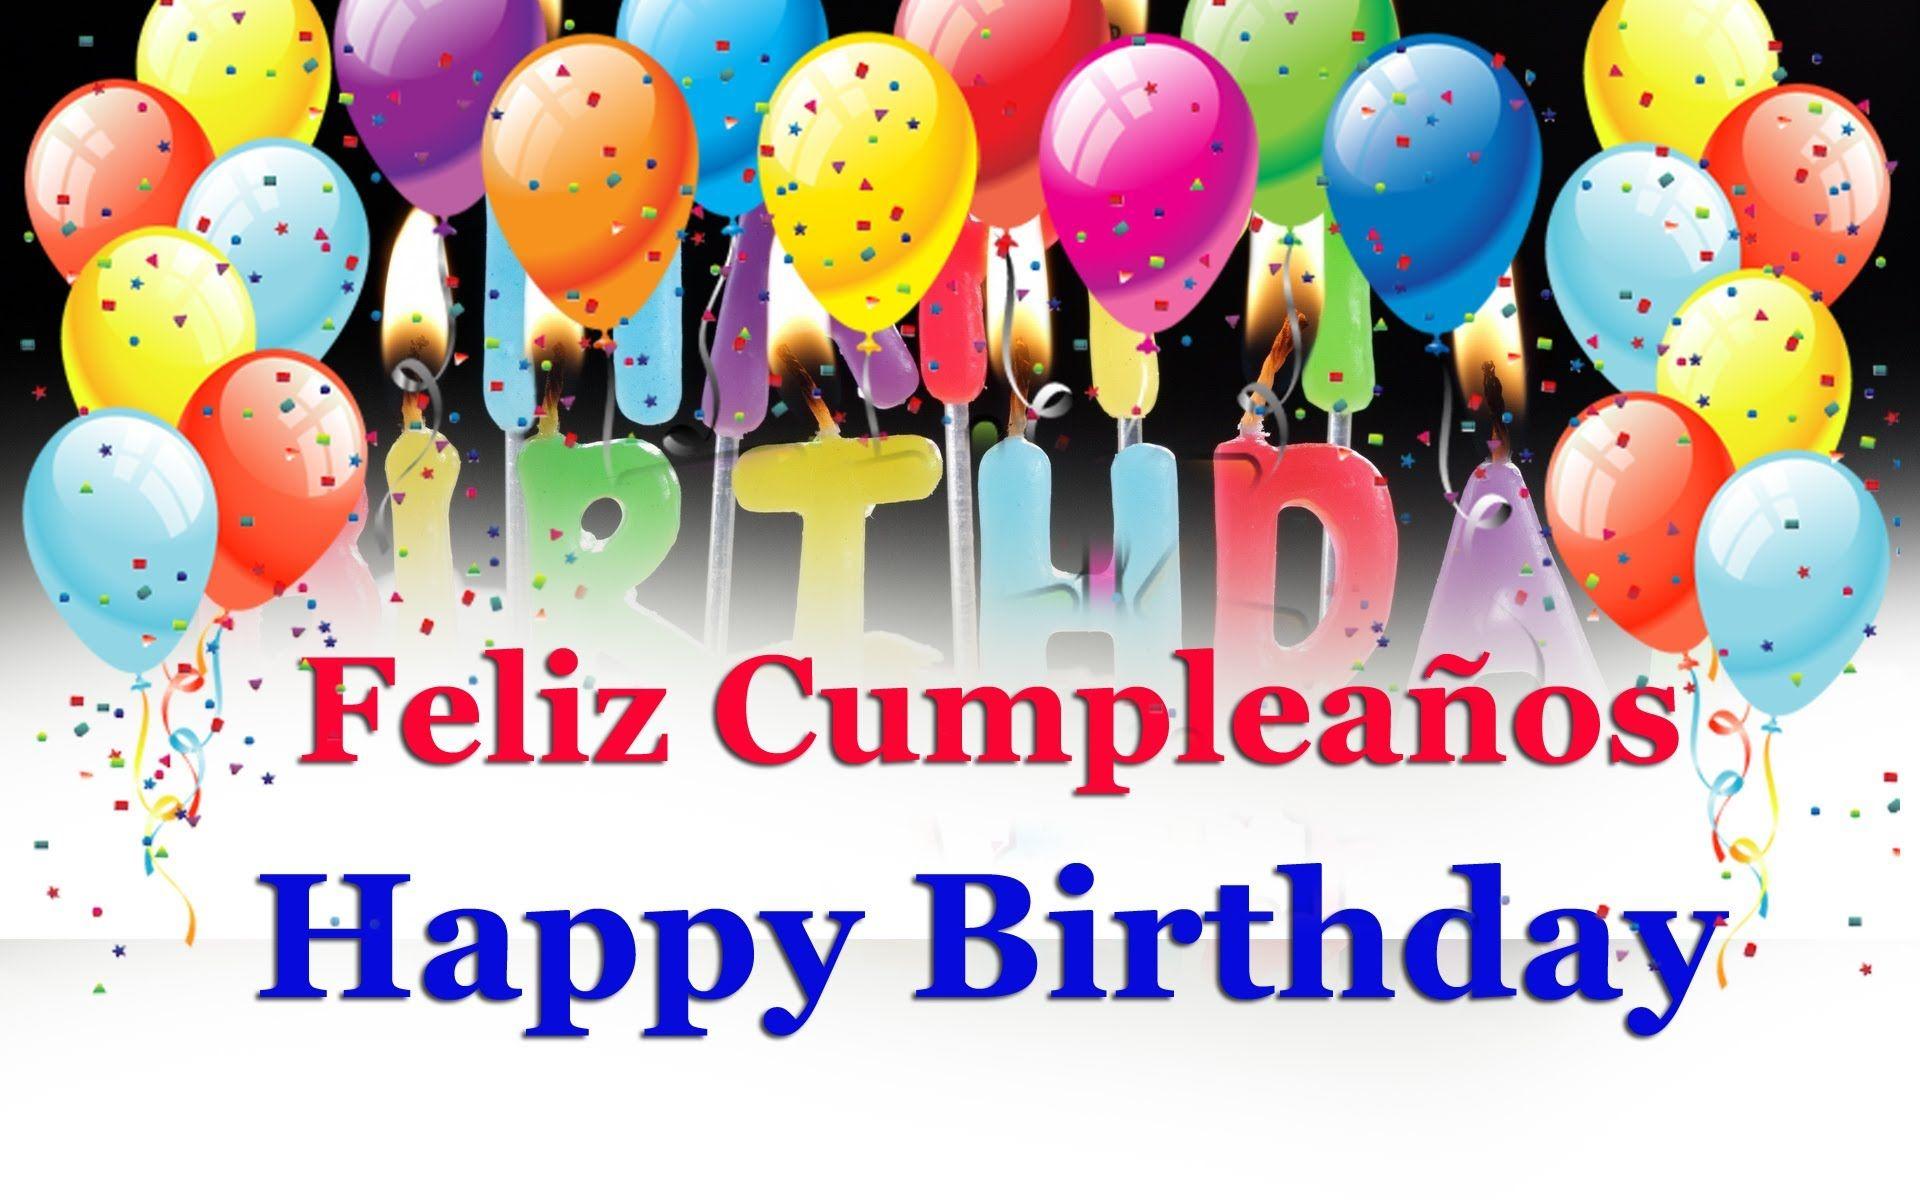 happy birthday spanish Happy birthday Spanish Greeting